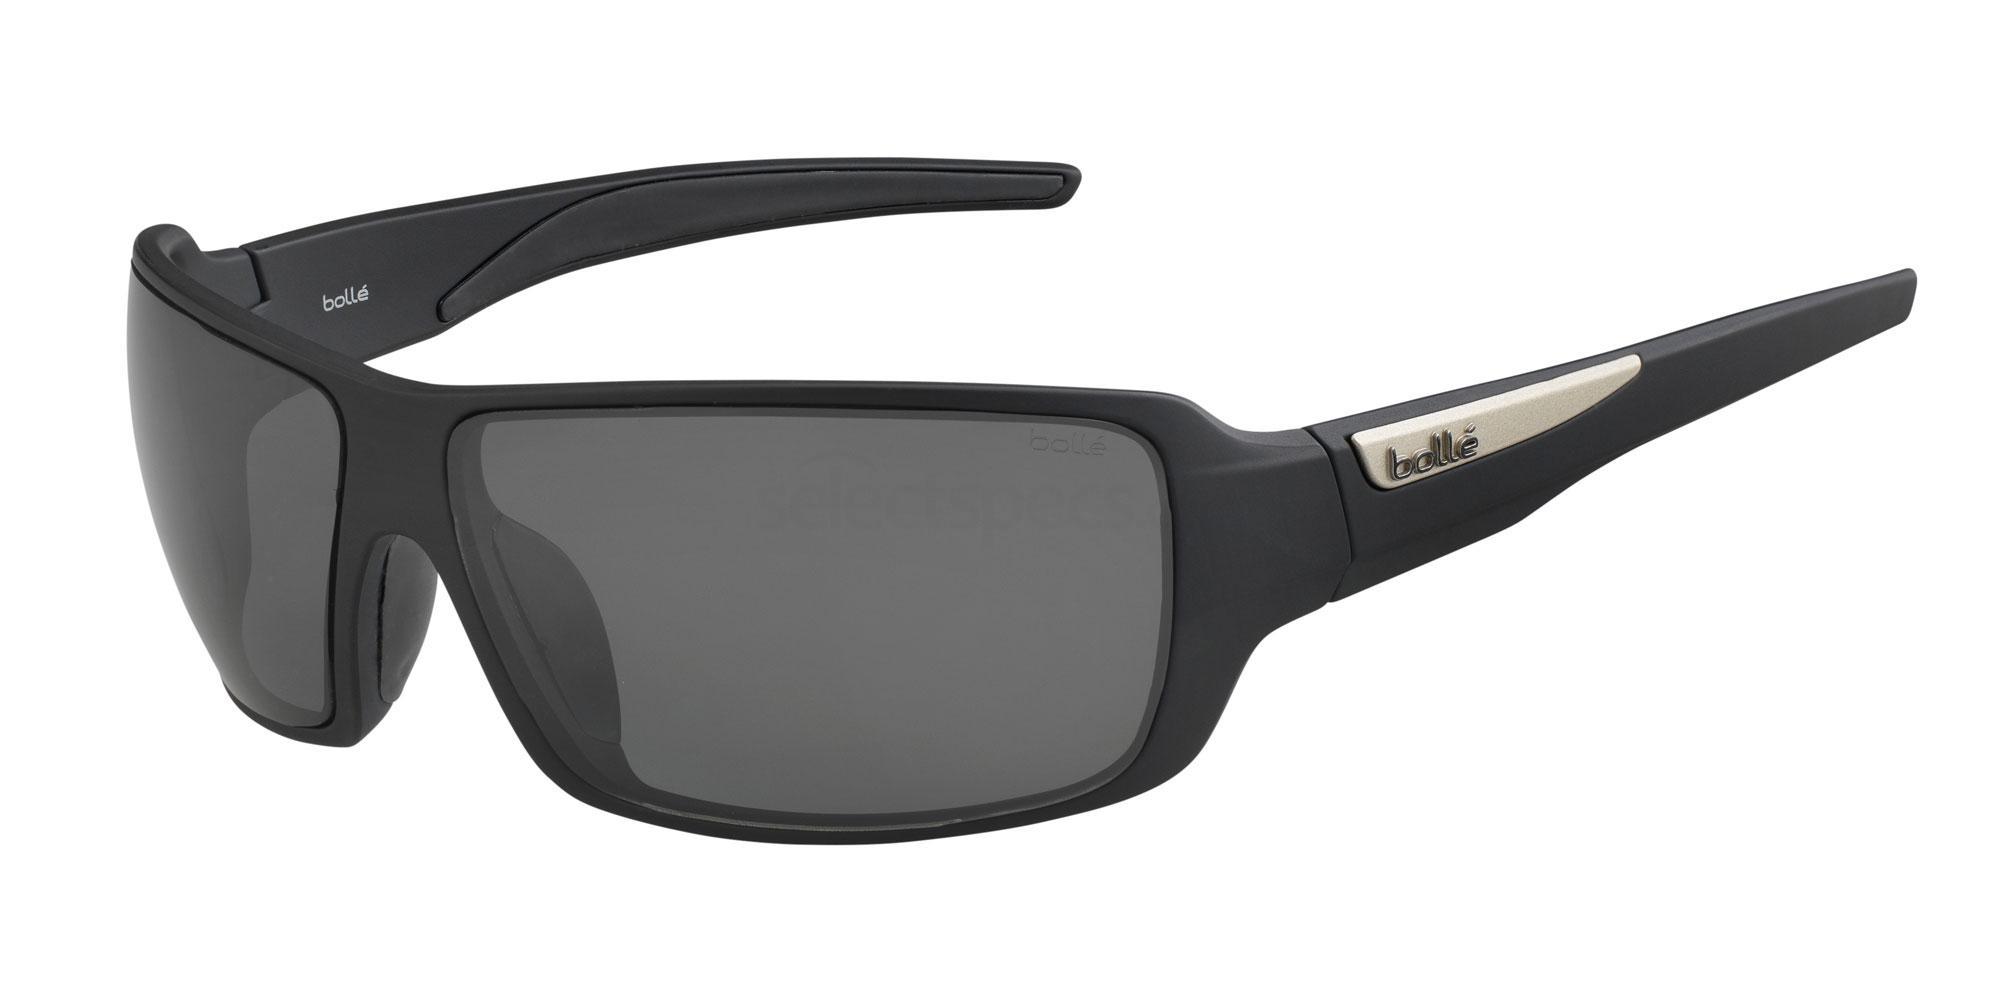 12220 Cary Sunglasses, Bolle